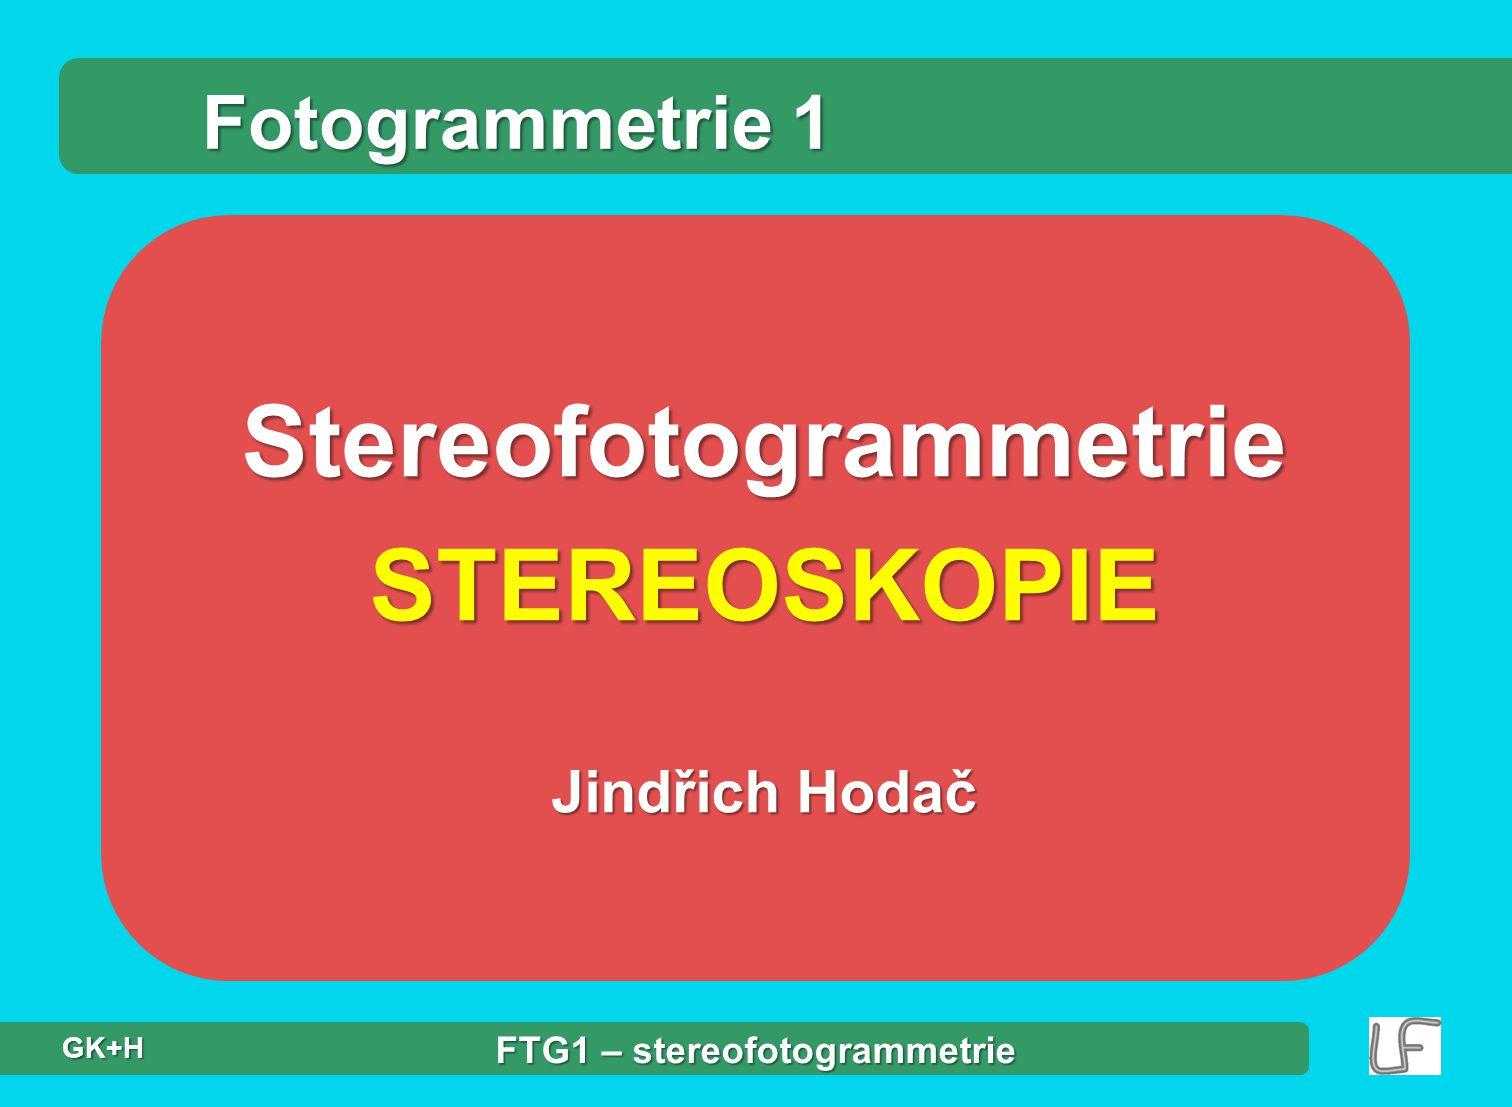 StereofotogrammetrieSTEREOSKOPIE Jindřich Hodač Fotogrammetrie 1 FTG1 – stereofotogrammetrie GK+H